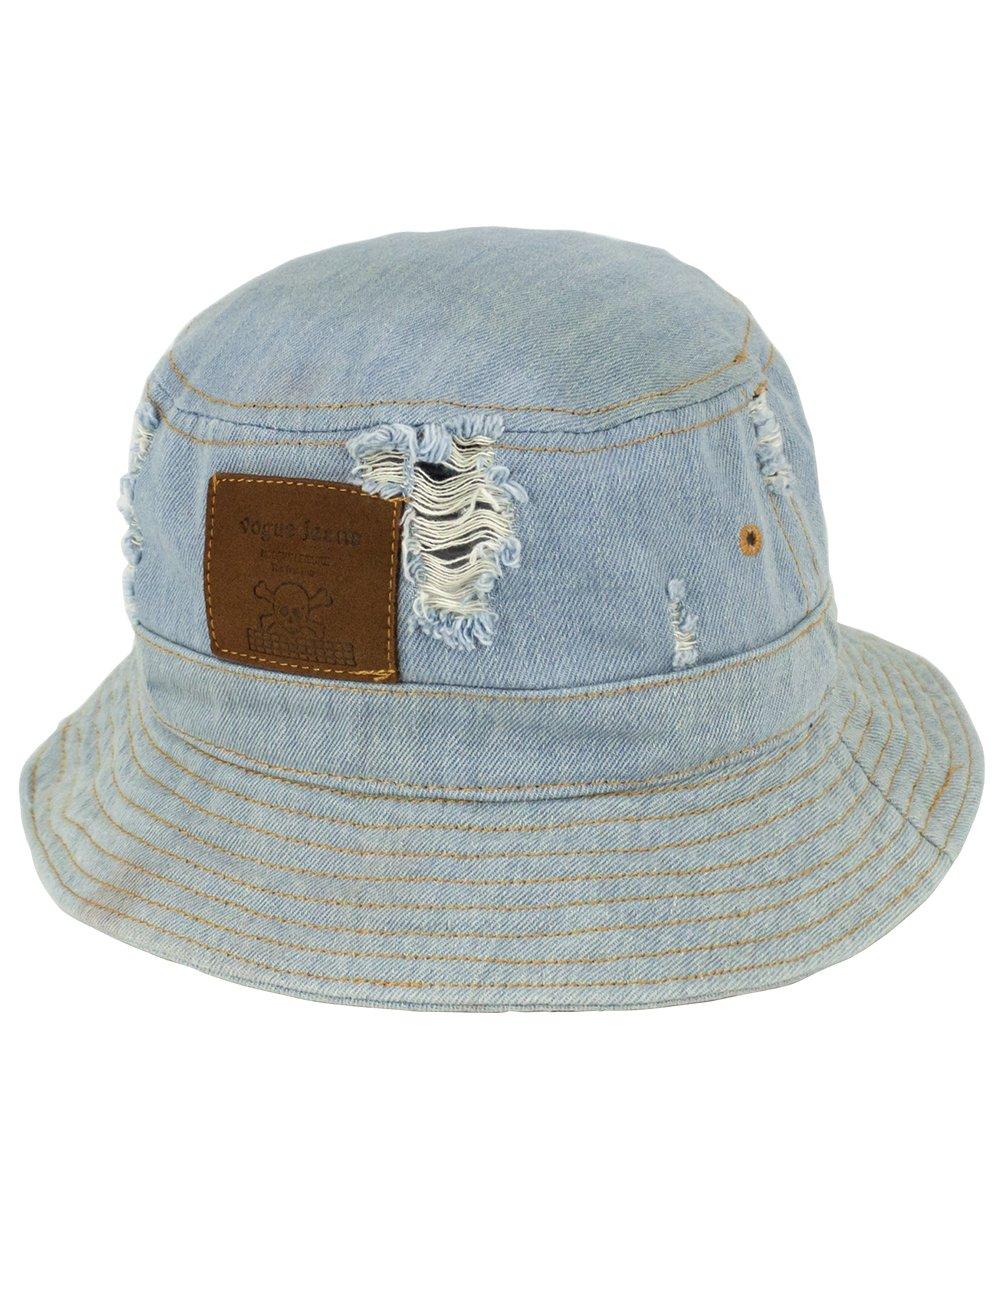 Dahlia Summer Sun Hat - Casual Distressed Denim Bucket Hat - Light Blue